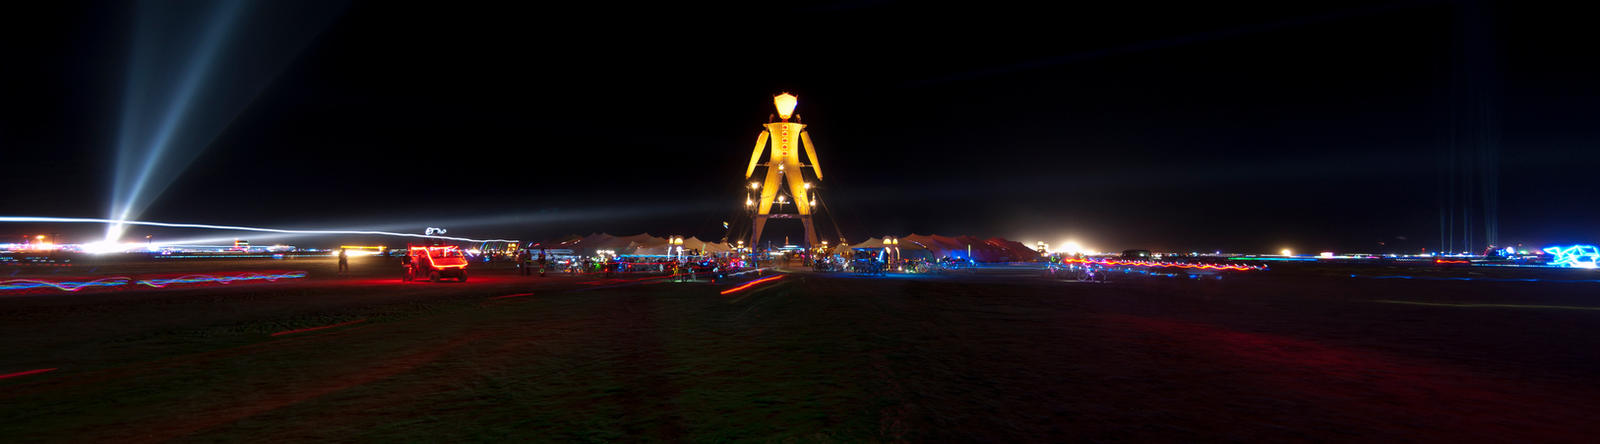 Burning Man 2014 Panorama by Eesu